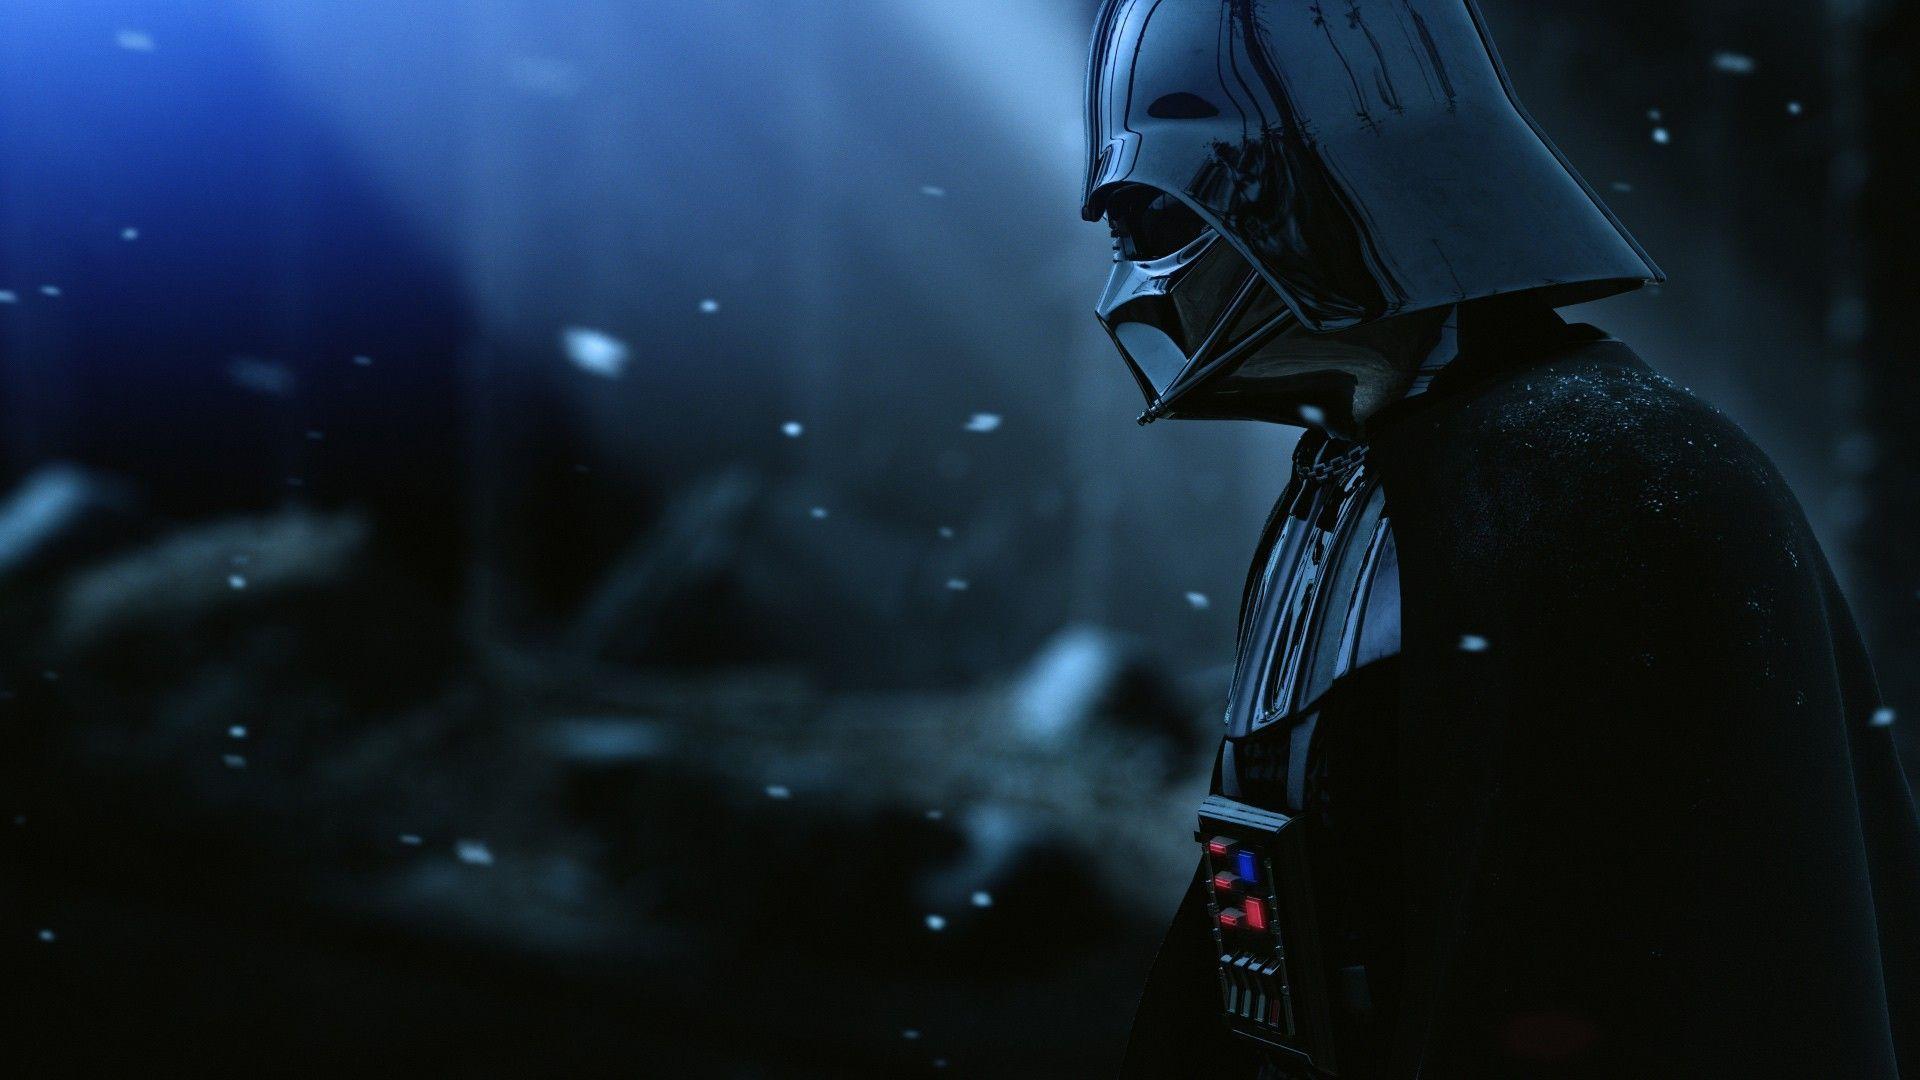 485 Star Wars Wallpapers Darth Vader Wallpaper Star Wars Background Star Wars Wallpaper